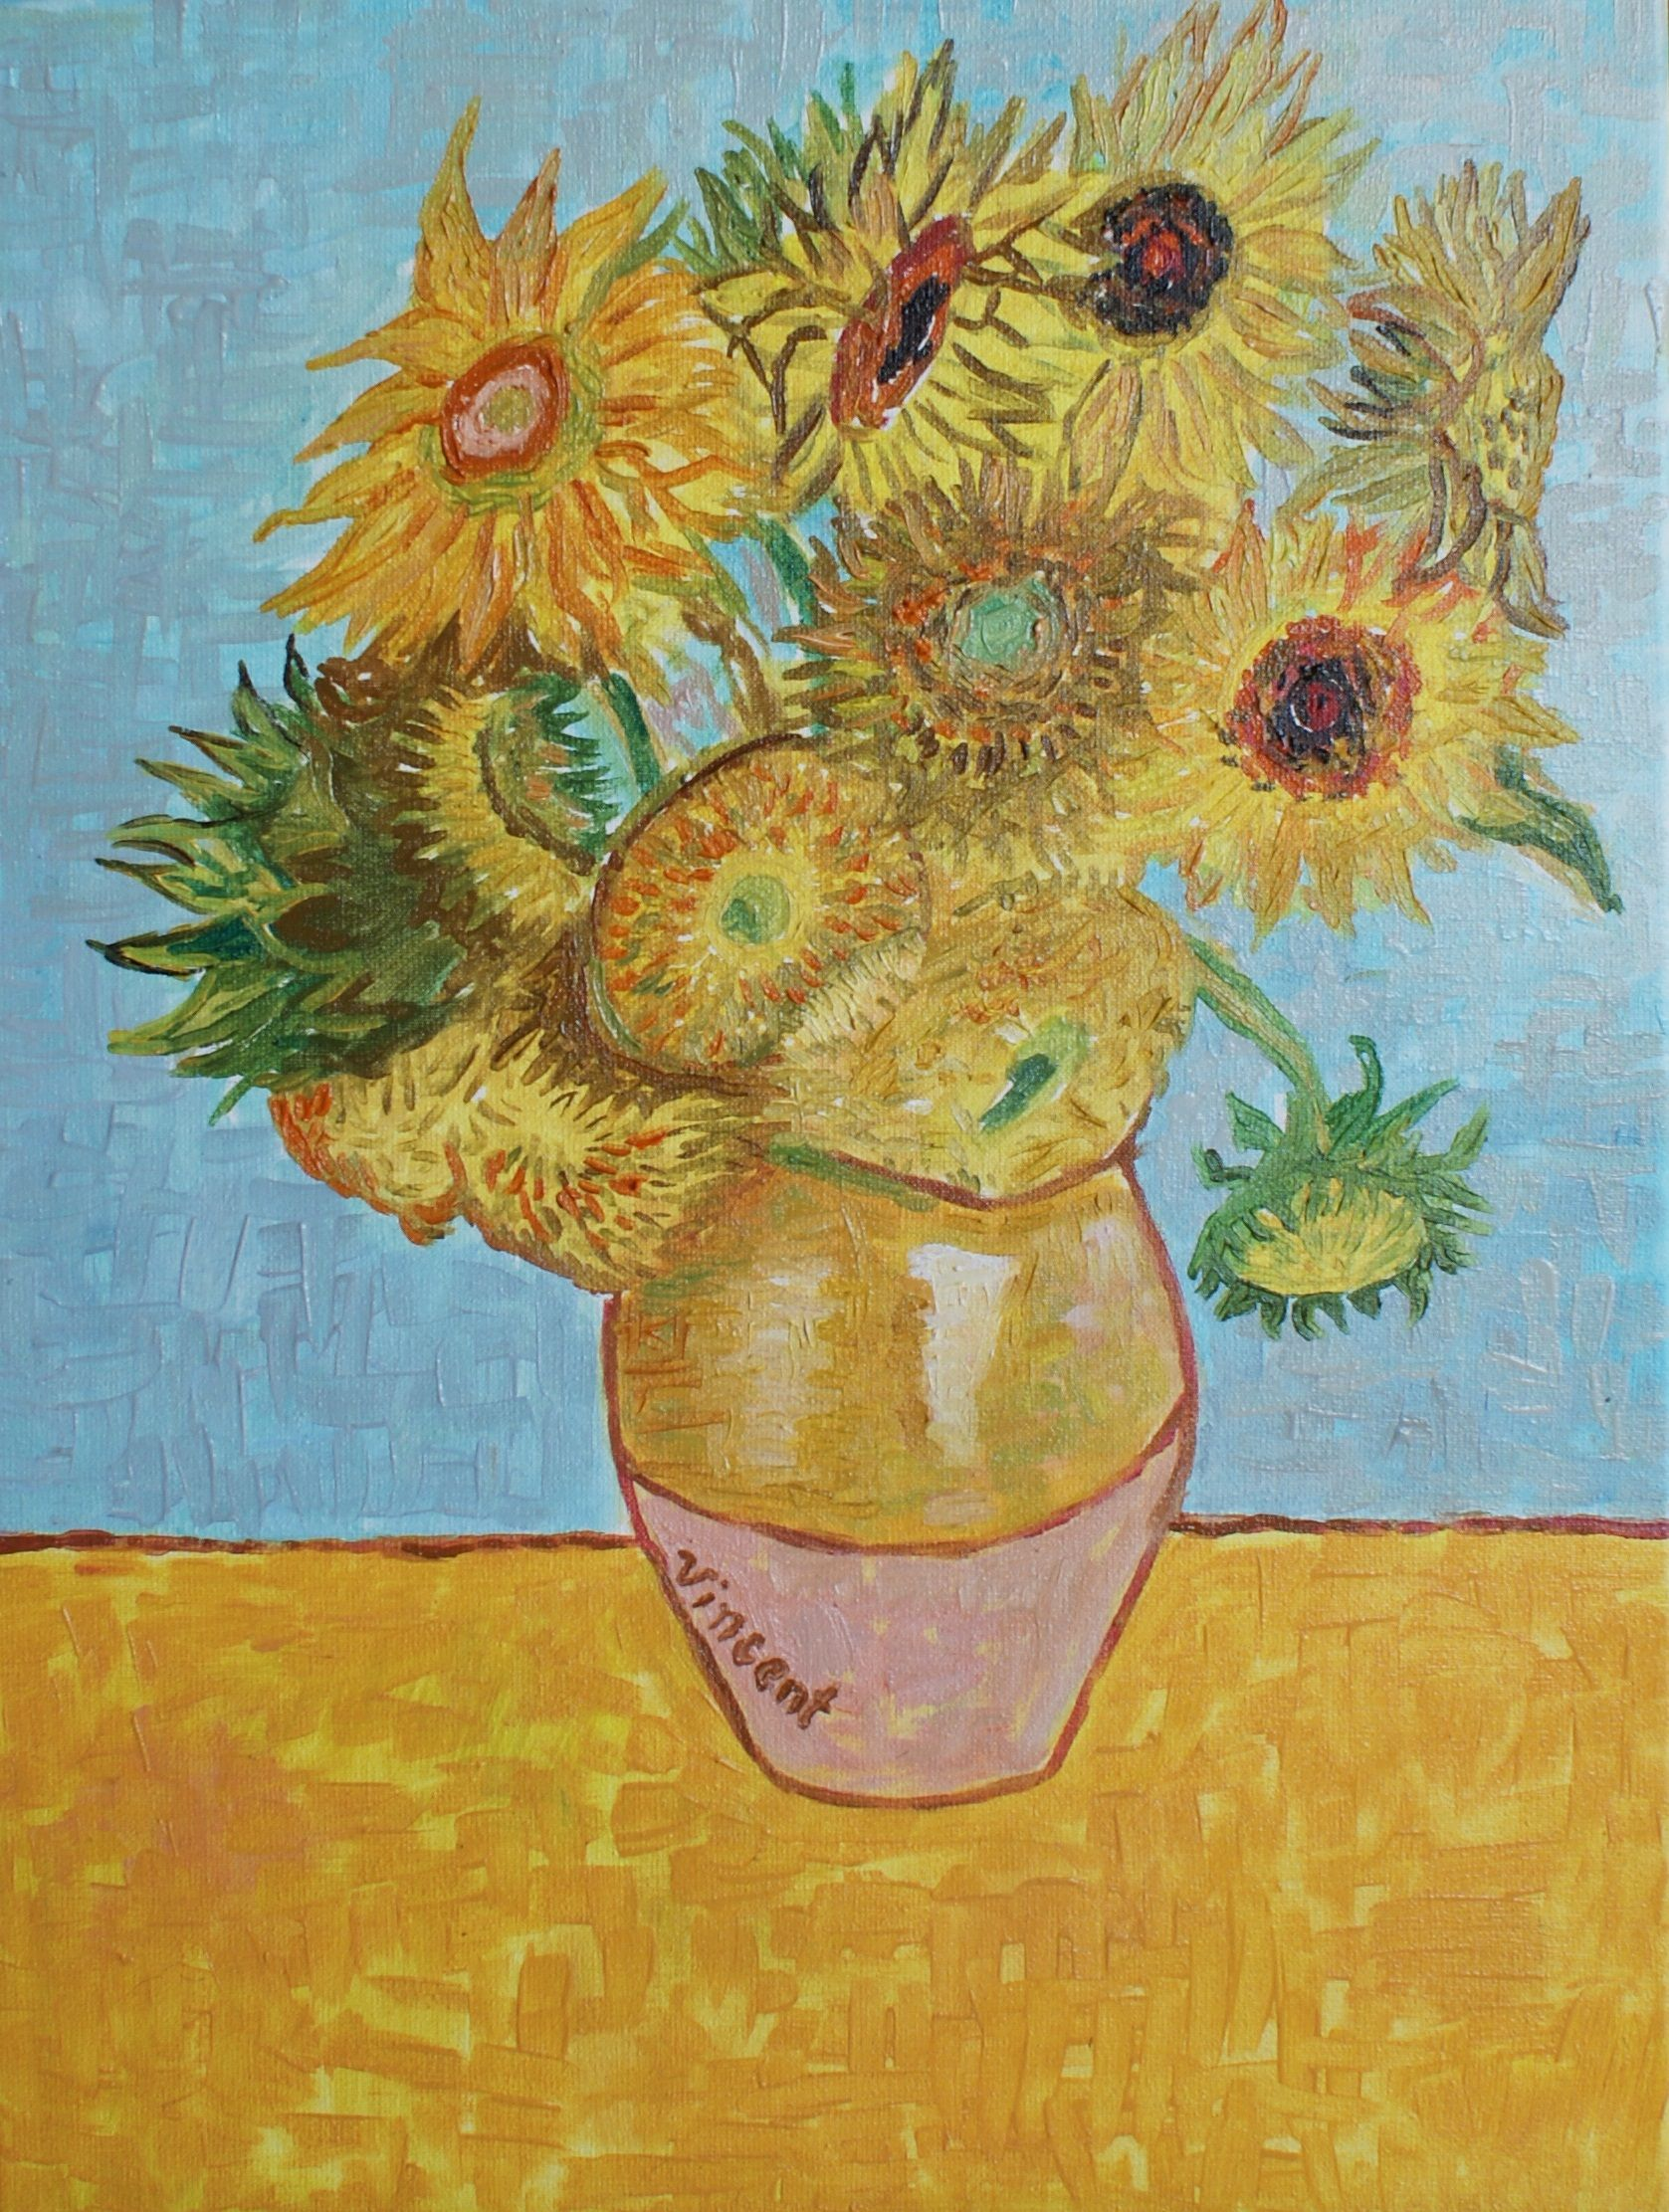 Sunflowers Vincent Van Gogh Art For Sale Postimpresionissm Vincent Van Gogh Paintings Art Vincent Van Gogh Art